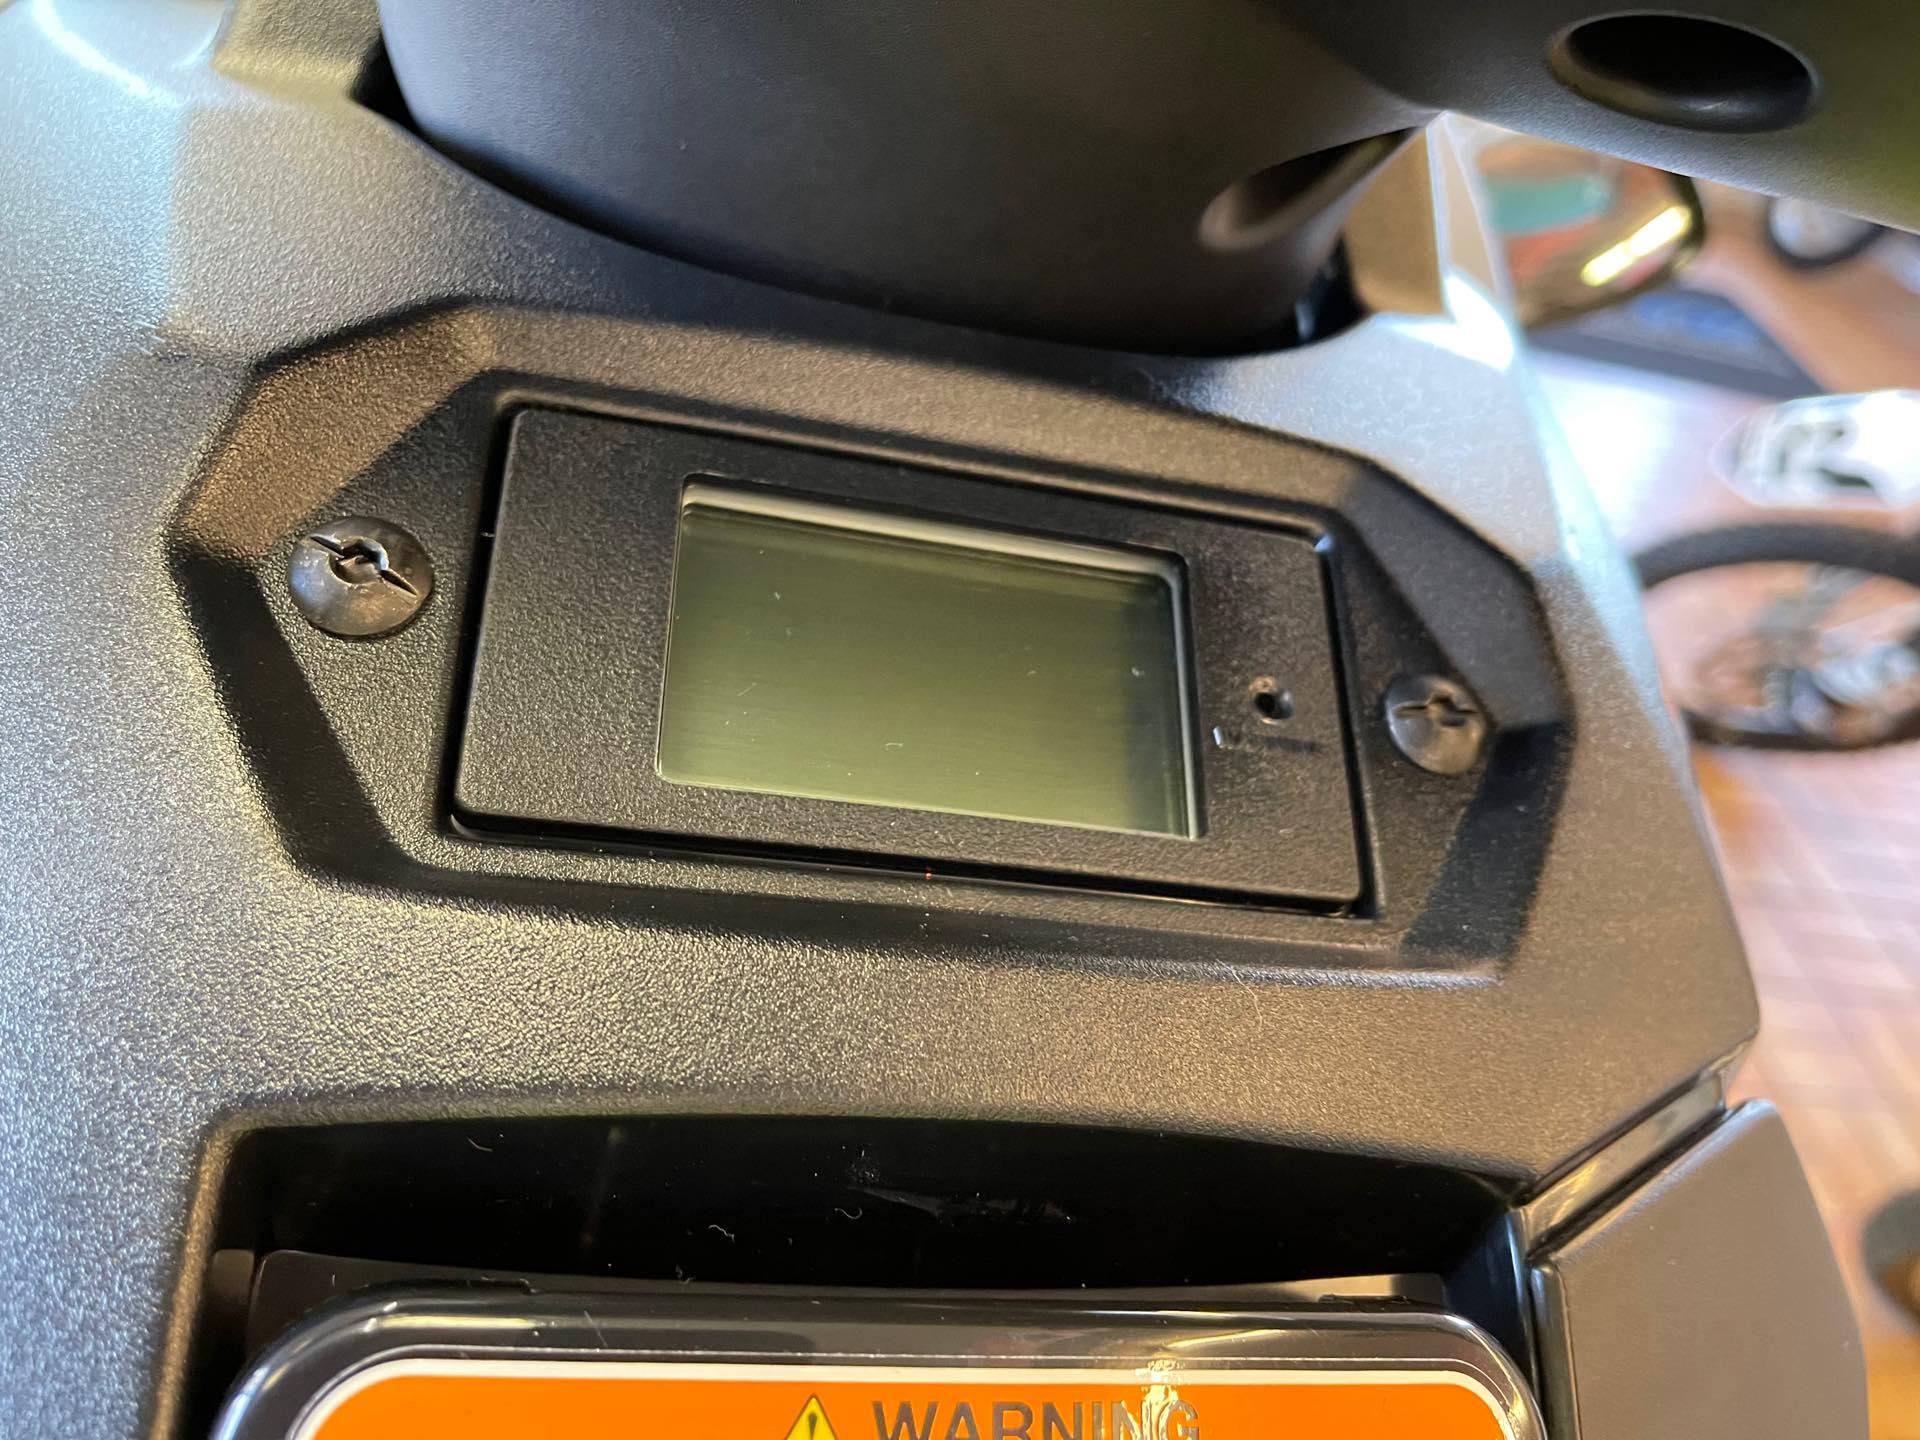 2021 Yamaha WaveRunner EX Sport at Bobby J's Yamaha, Albuquerque, NM 87110